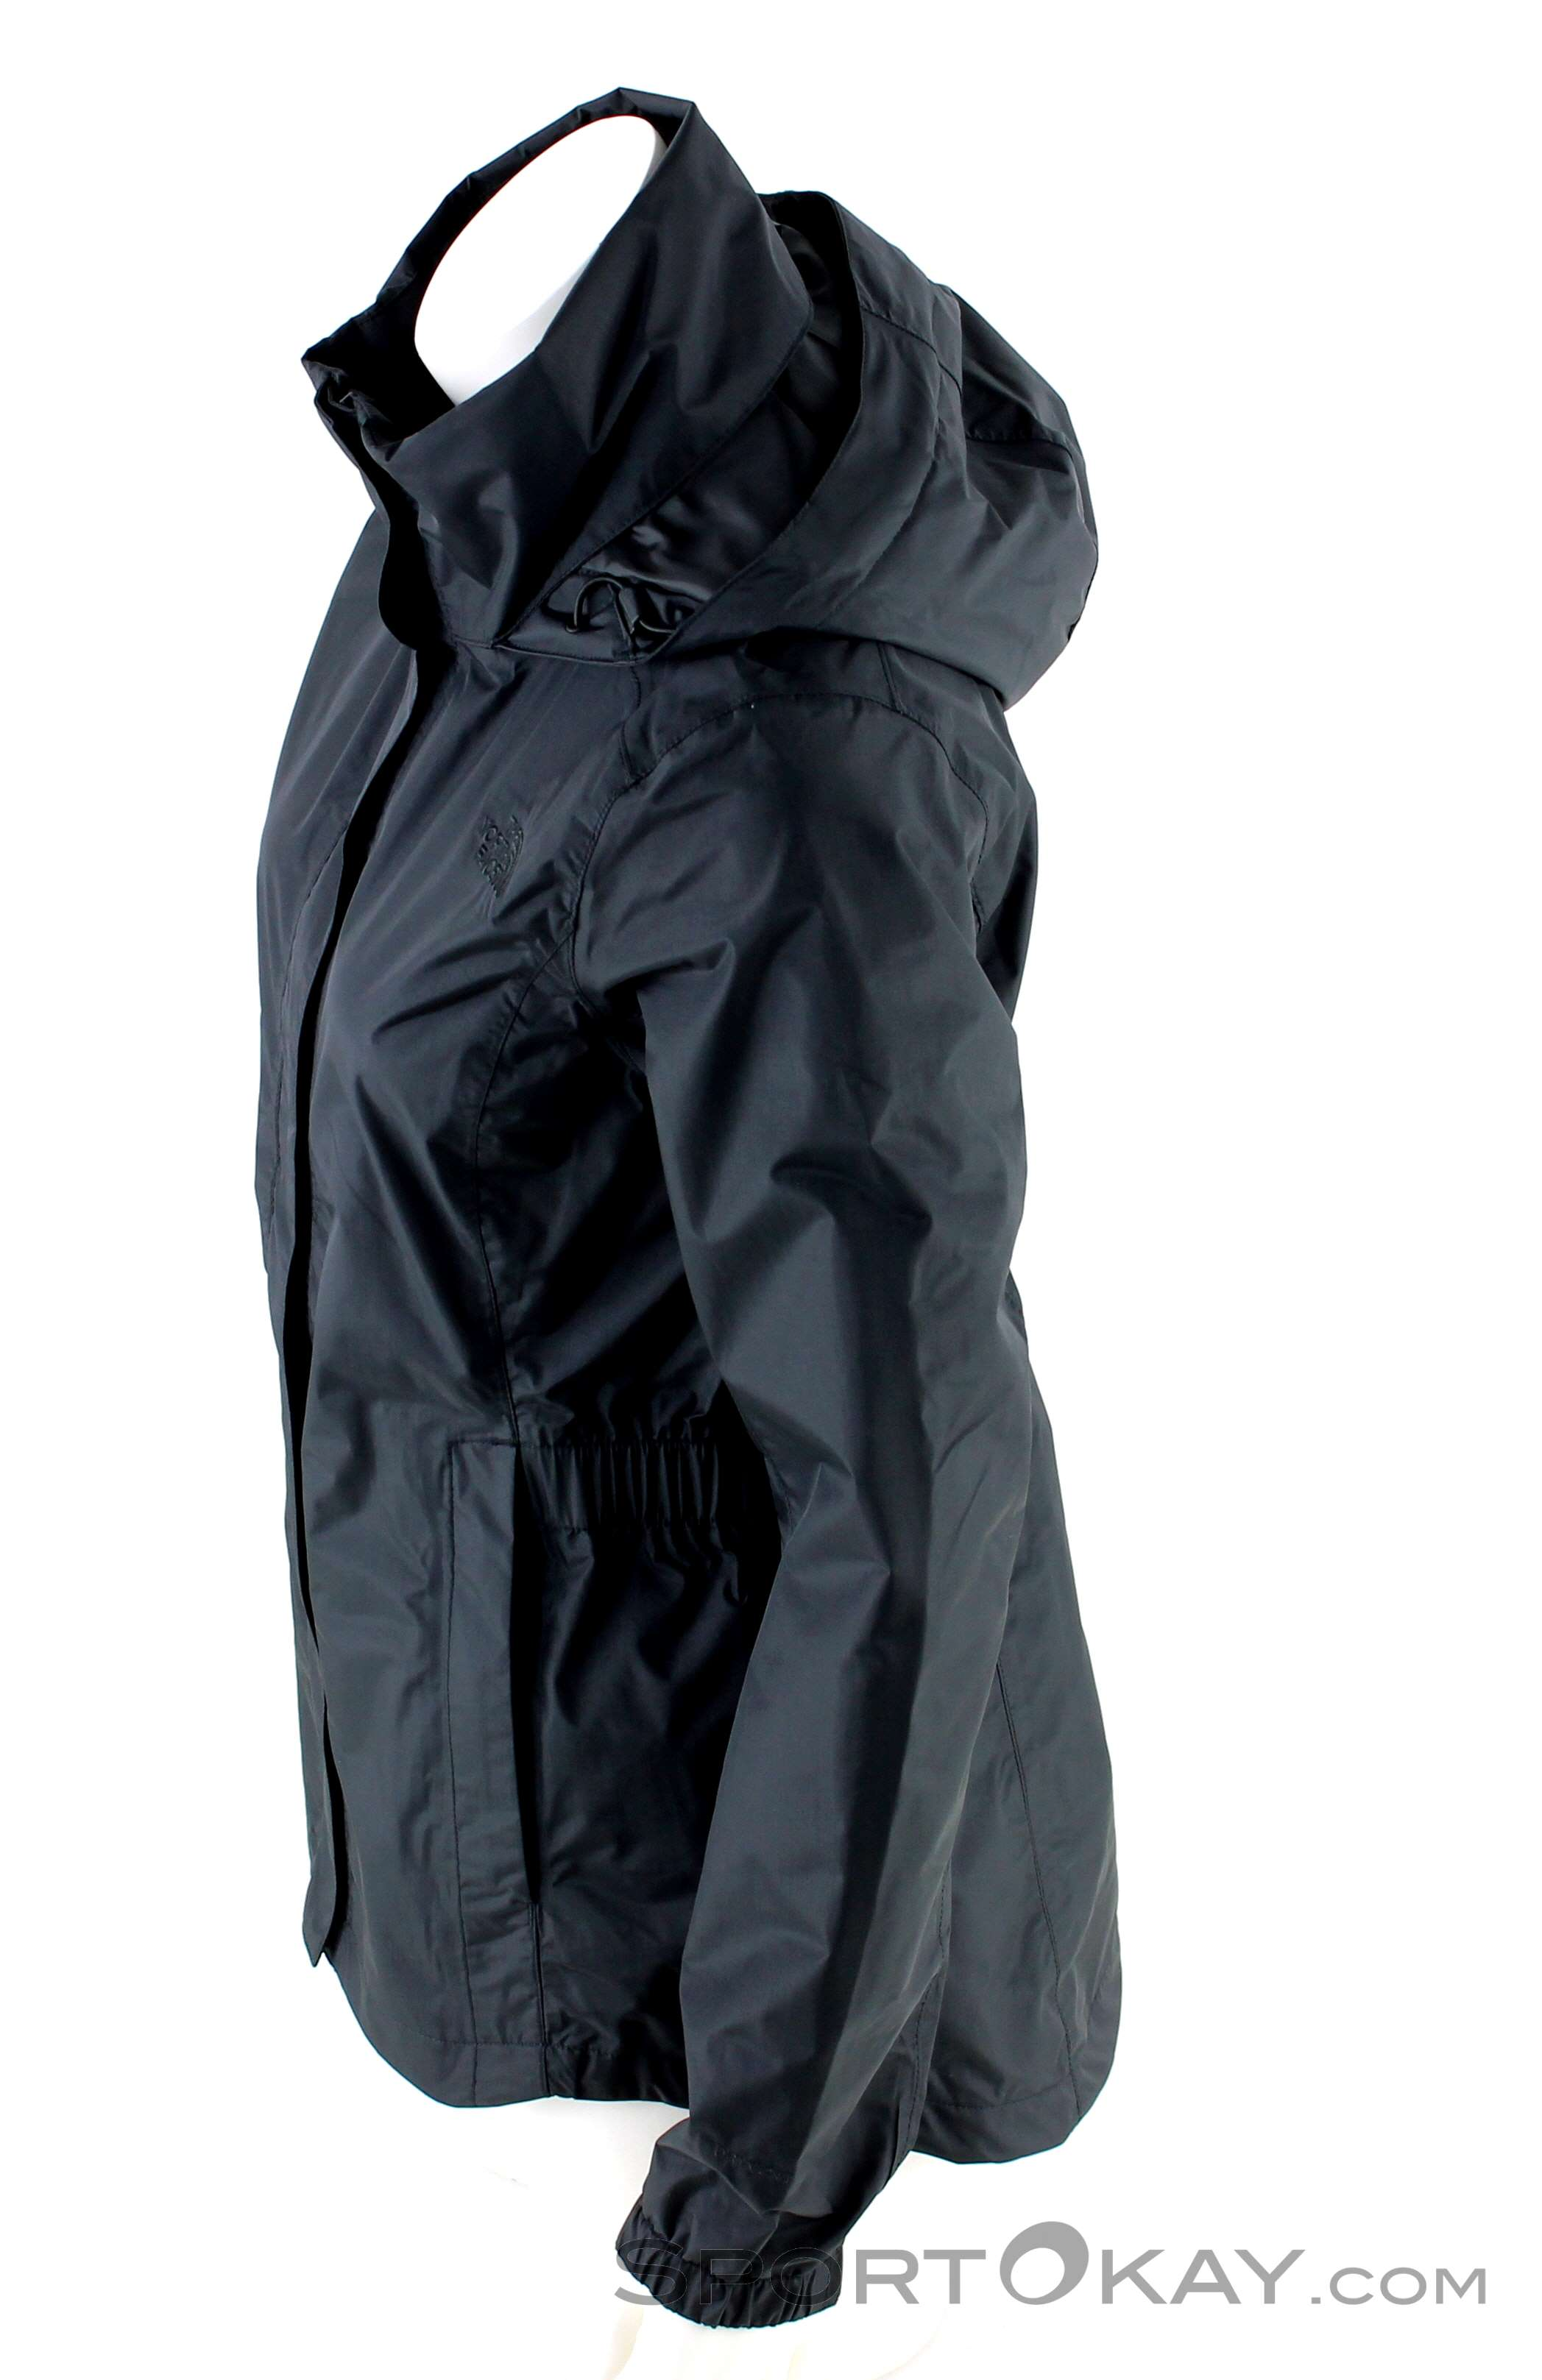 paul achs wein heilig zahnarzt münchen The North Face The North Face Resolve Parka II Womens Outdoor Jacket